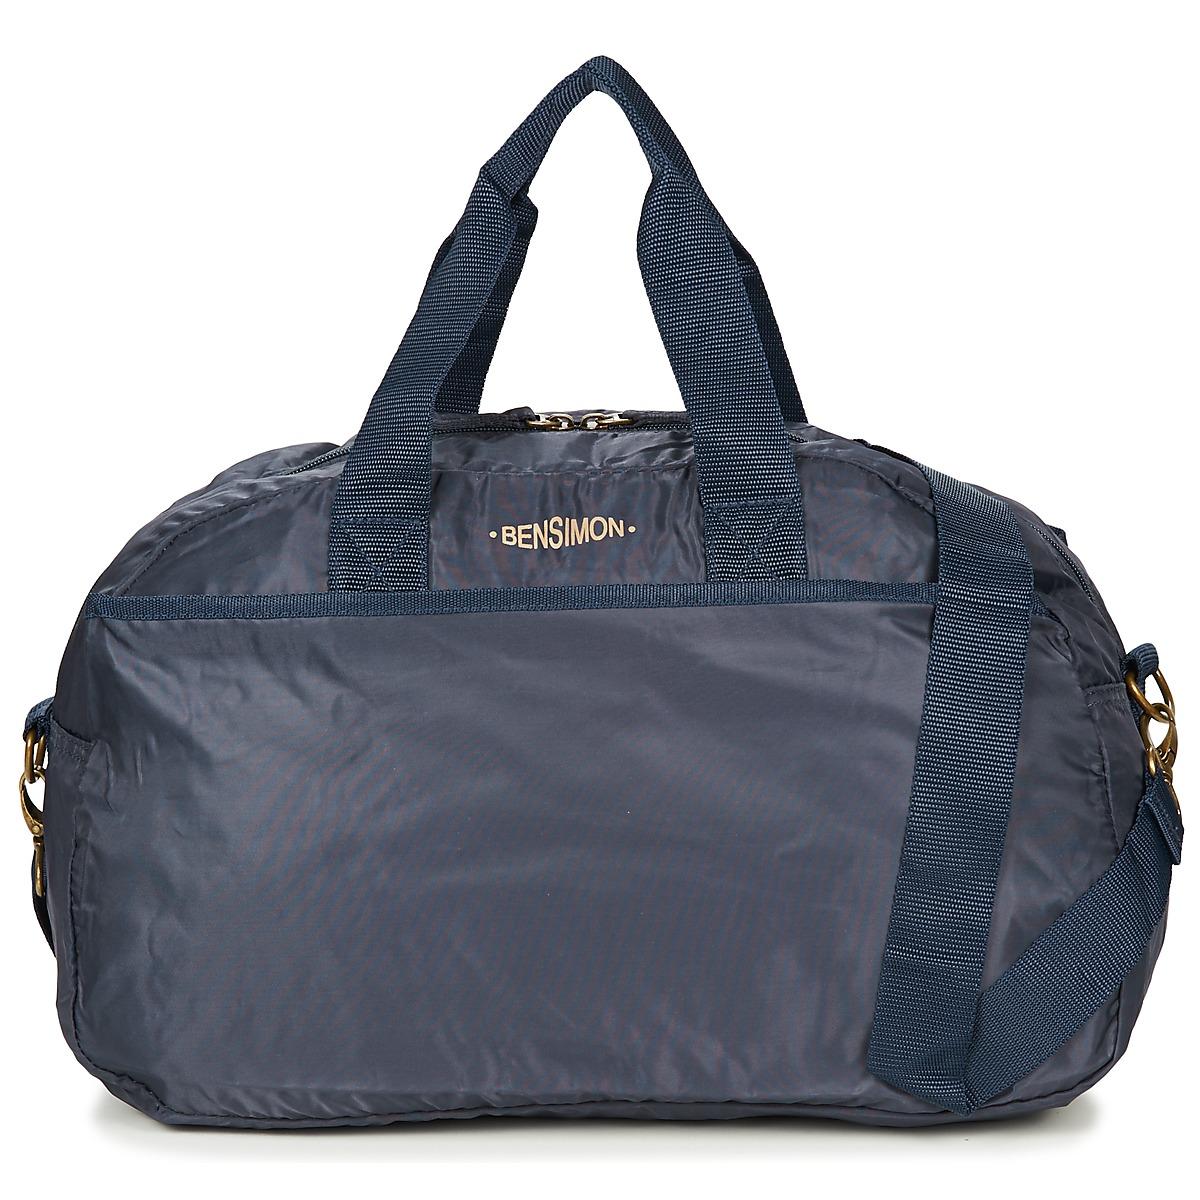 Borsa da sport donna Bensimon  SPORT BAG  Blu